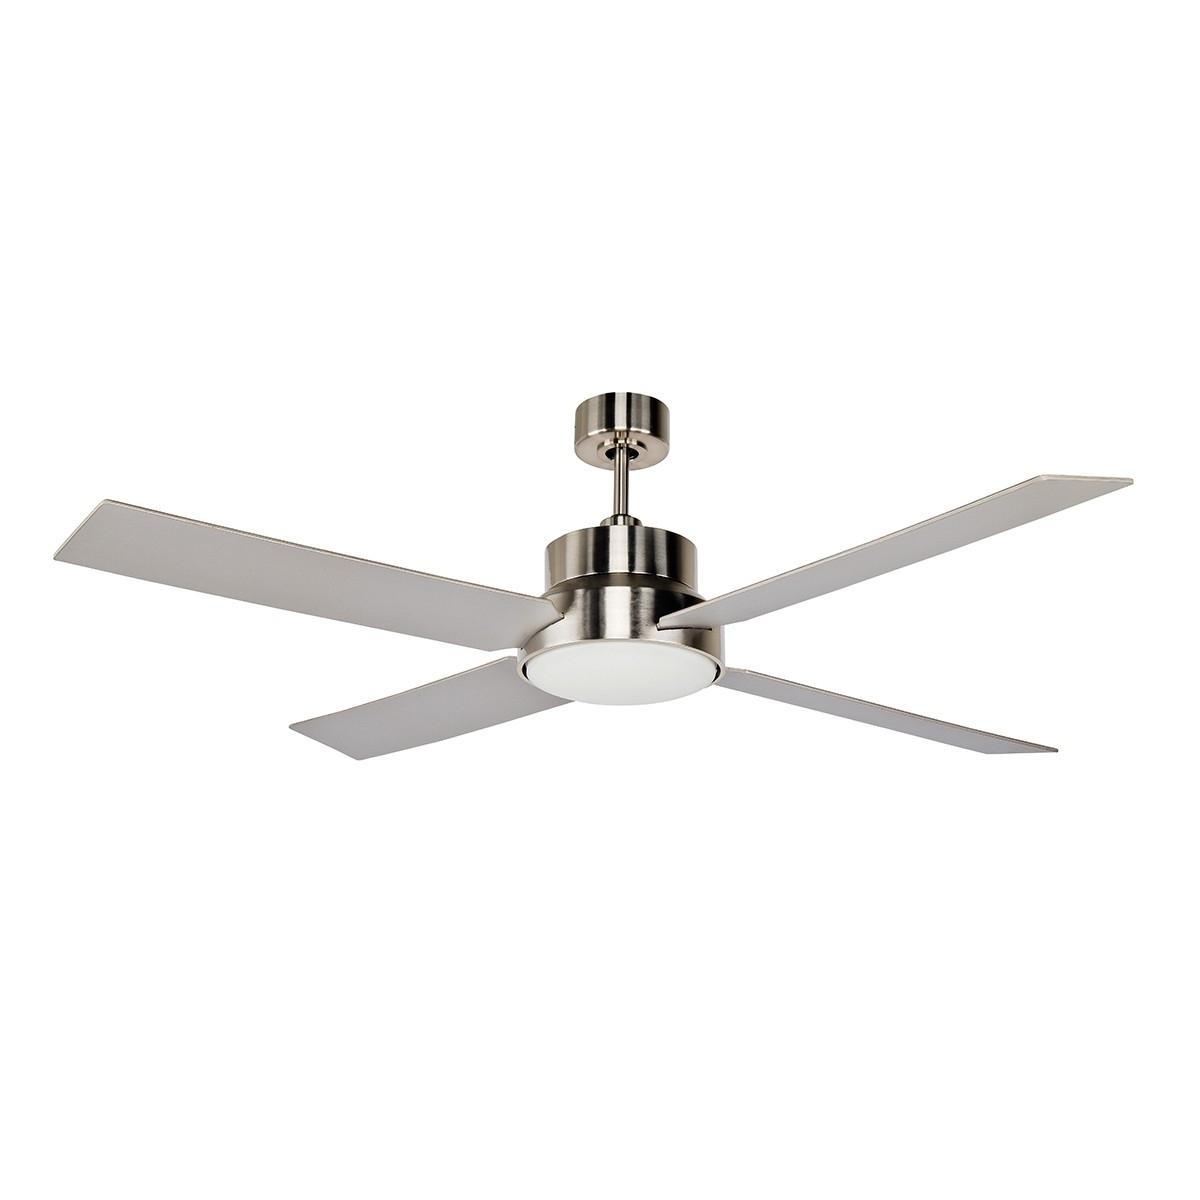 Dialogue Outdoor Ceiling Fan :: Stori Modern Regarding Most Recent Nickel Outdoor Ceiling Fans (View 18 of 20)